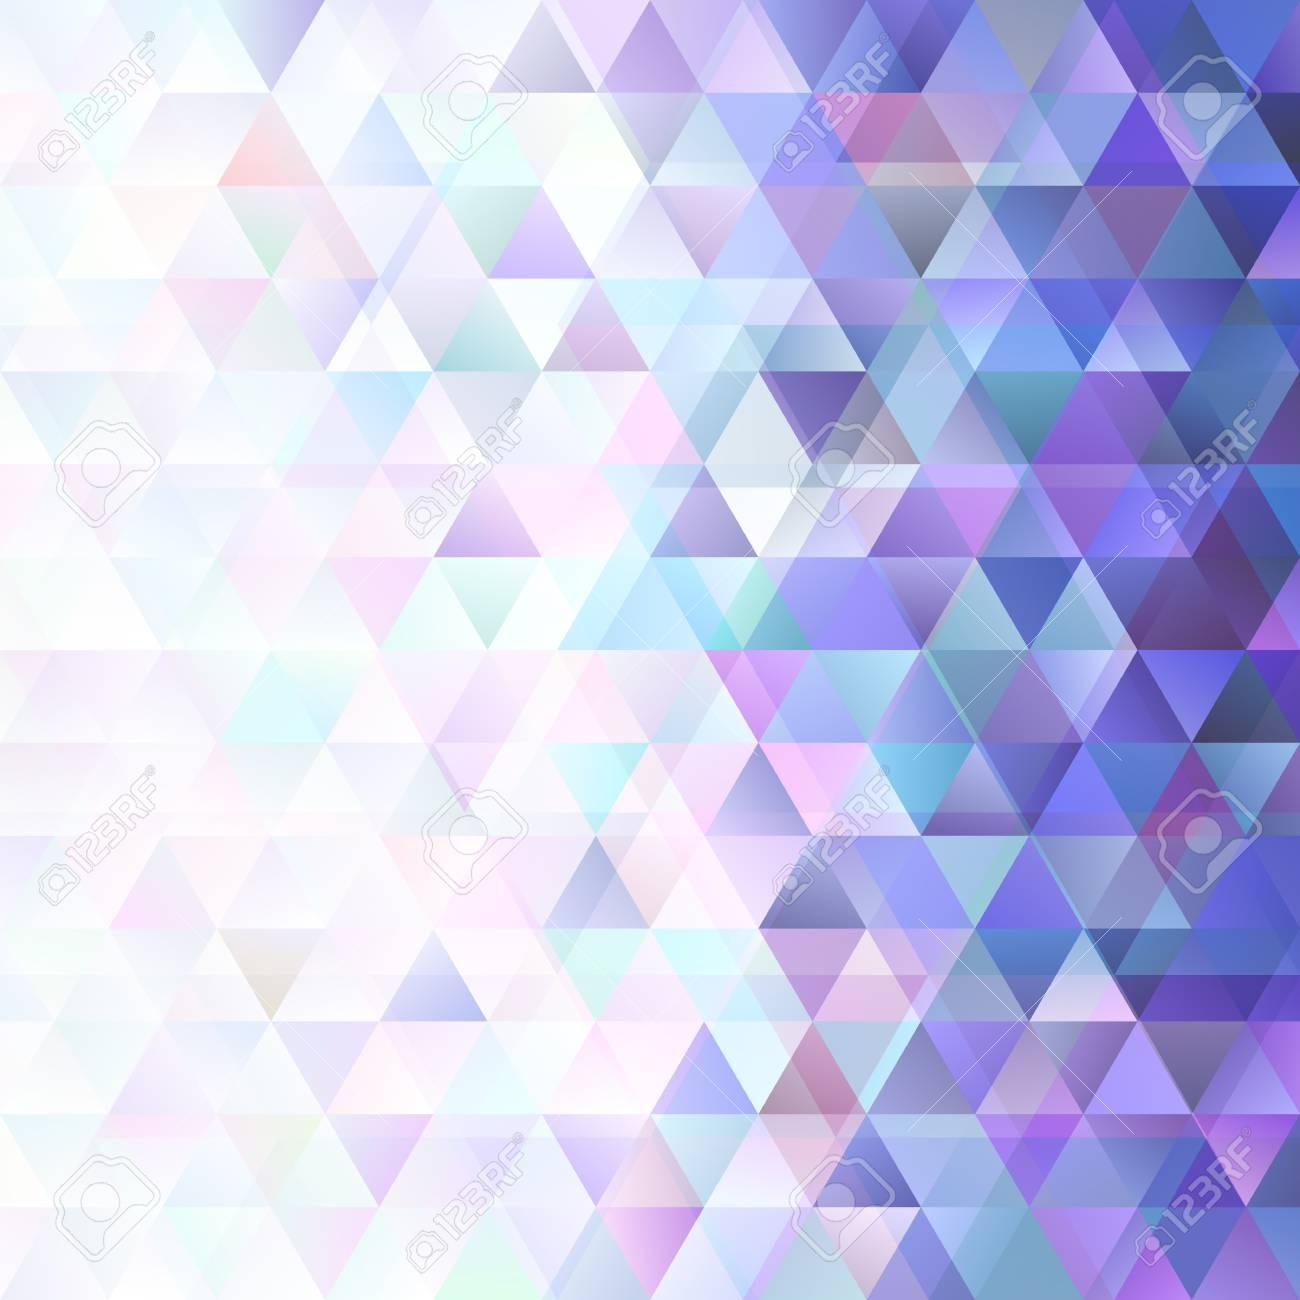 Gradient Retro Triangle Background Template Vector Graphic Design